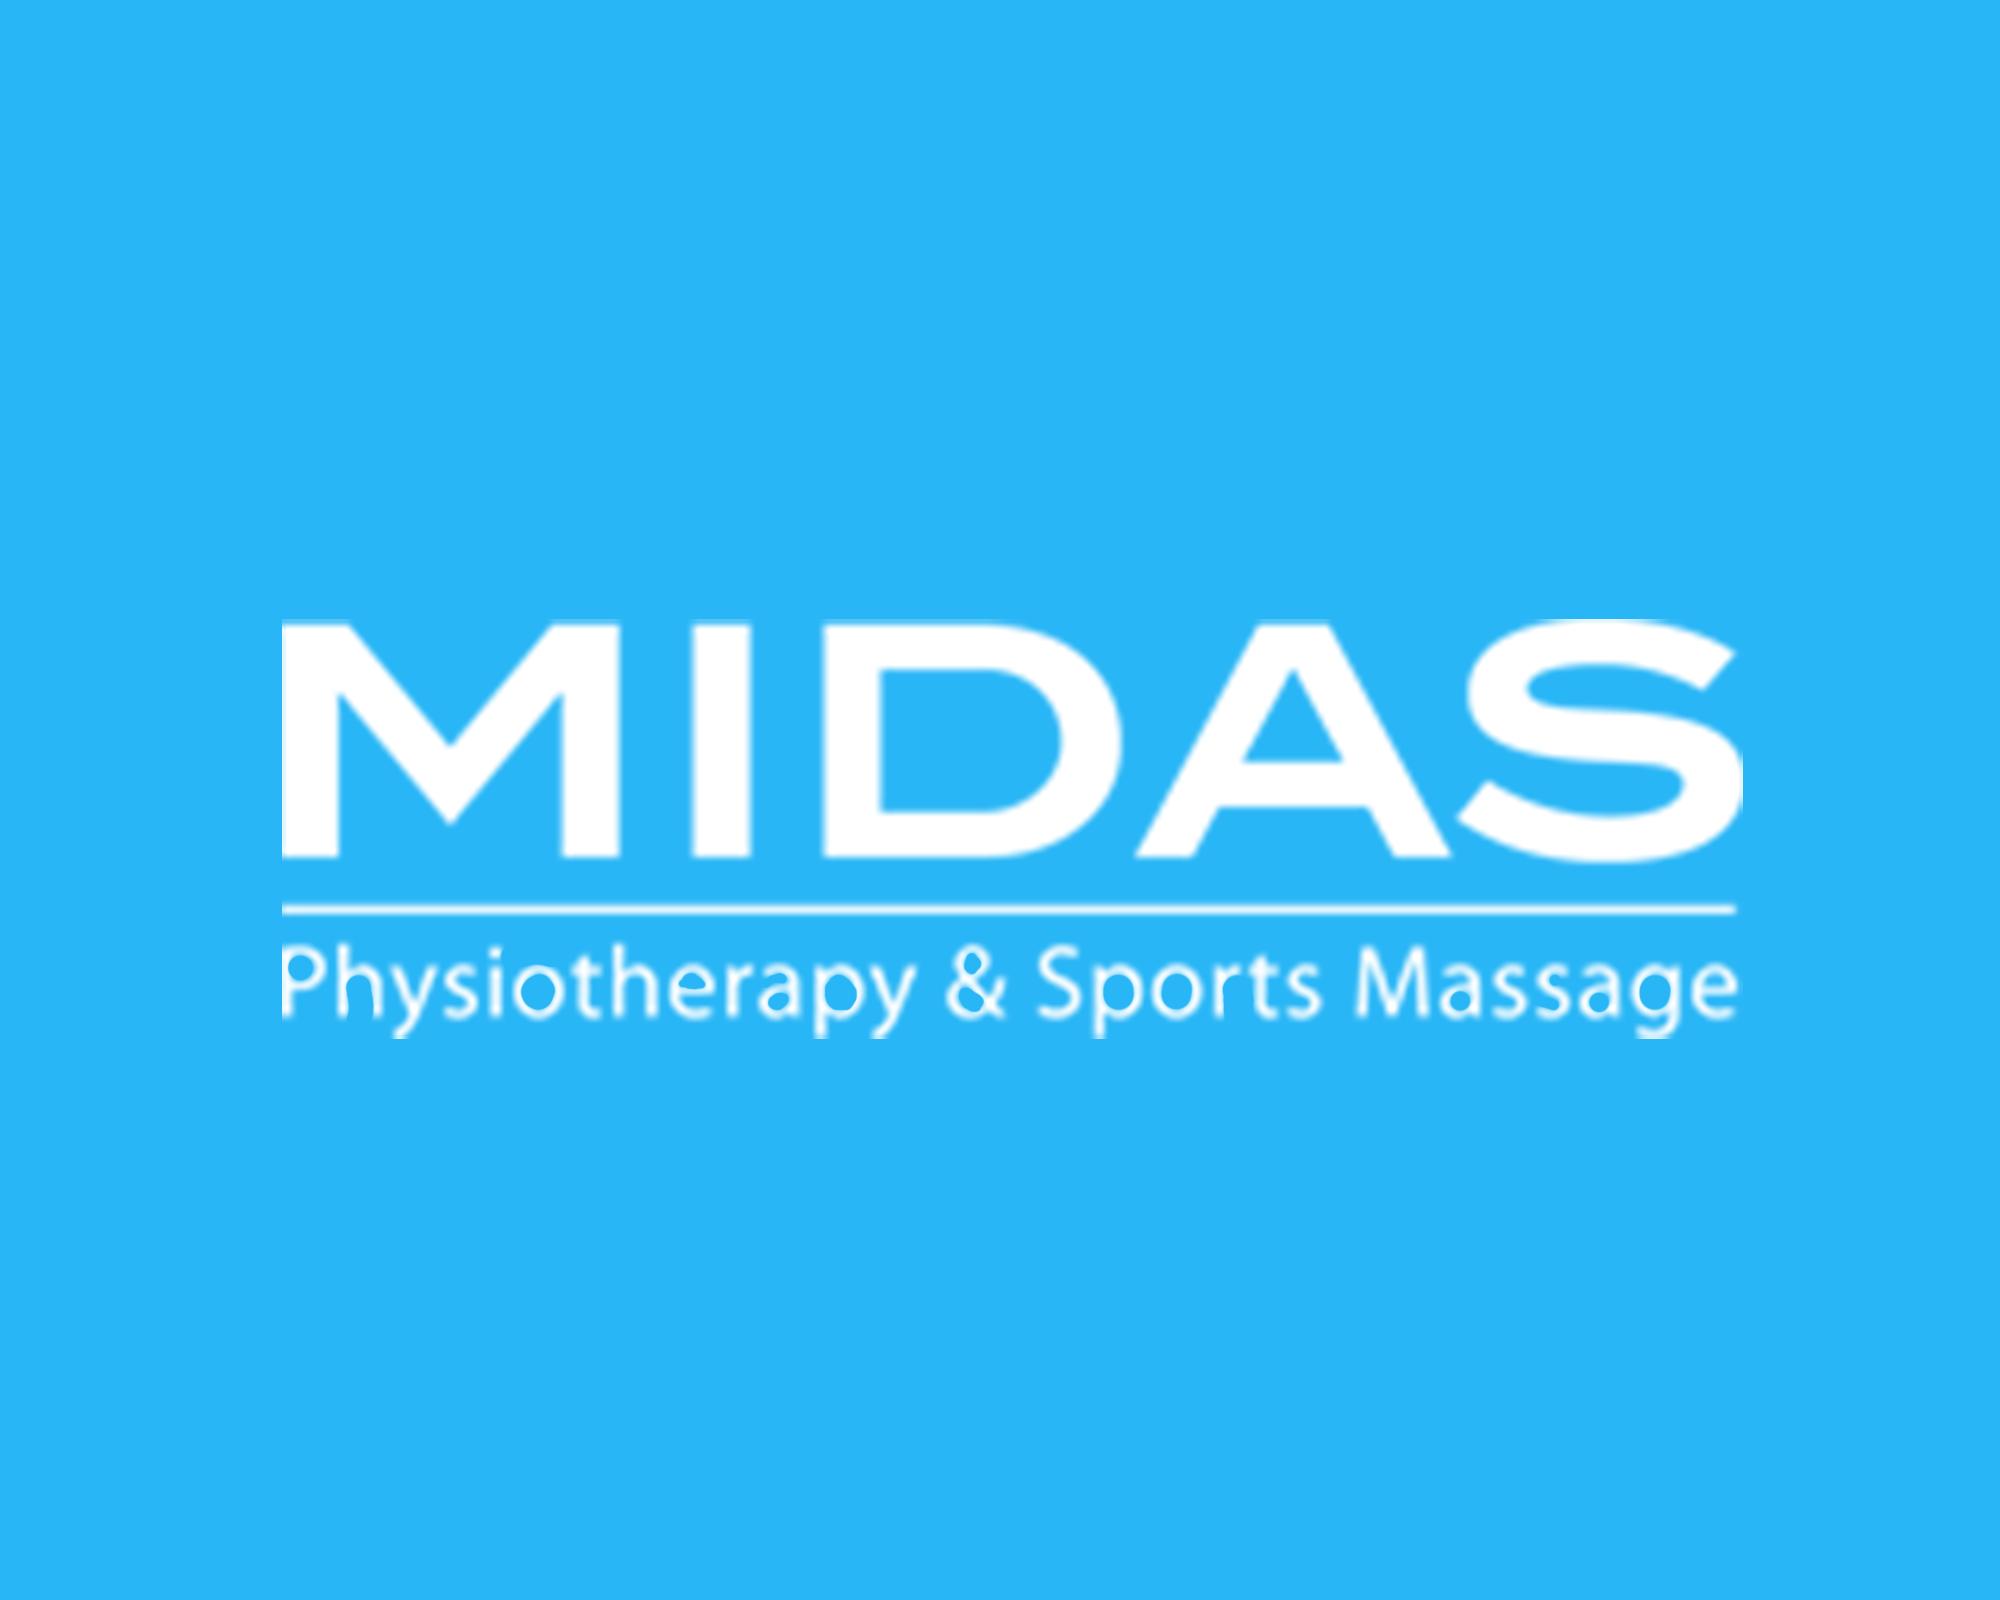 midas physiotherapy Logo